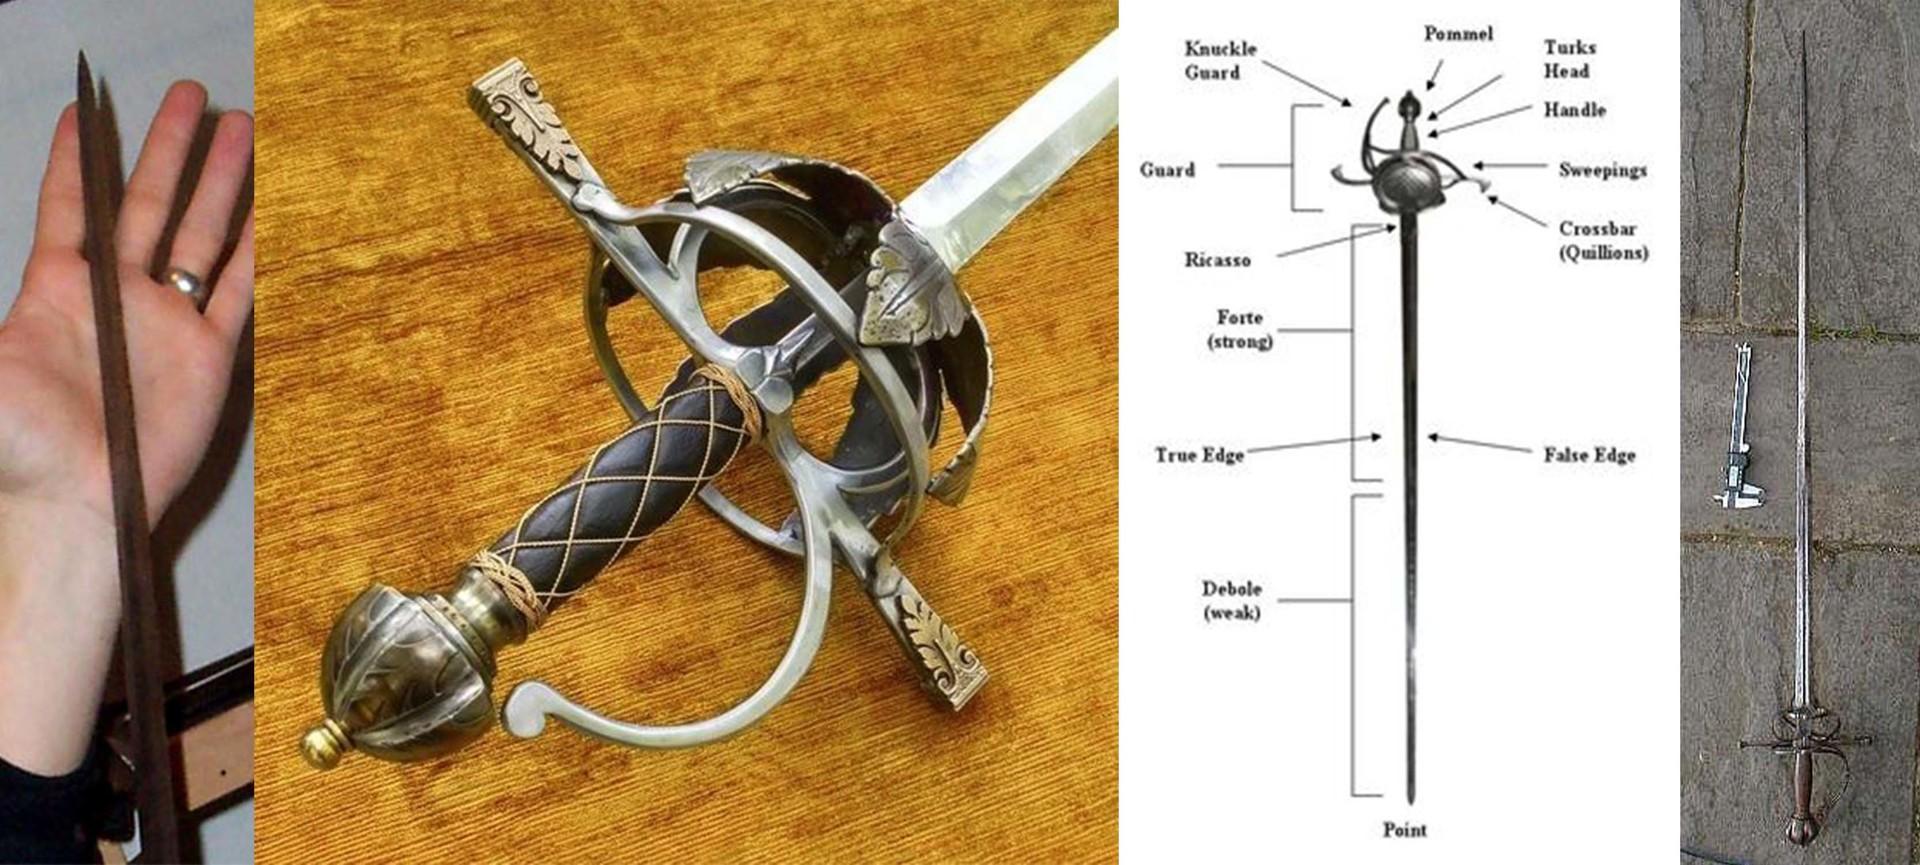 Oliver Fletcher Spanish Rapier Sword 1600 Wiring Diagram Spanishrapier Ref